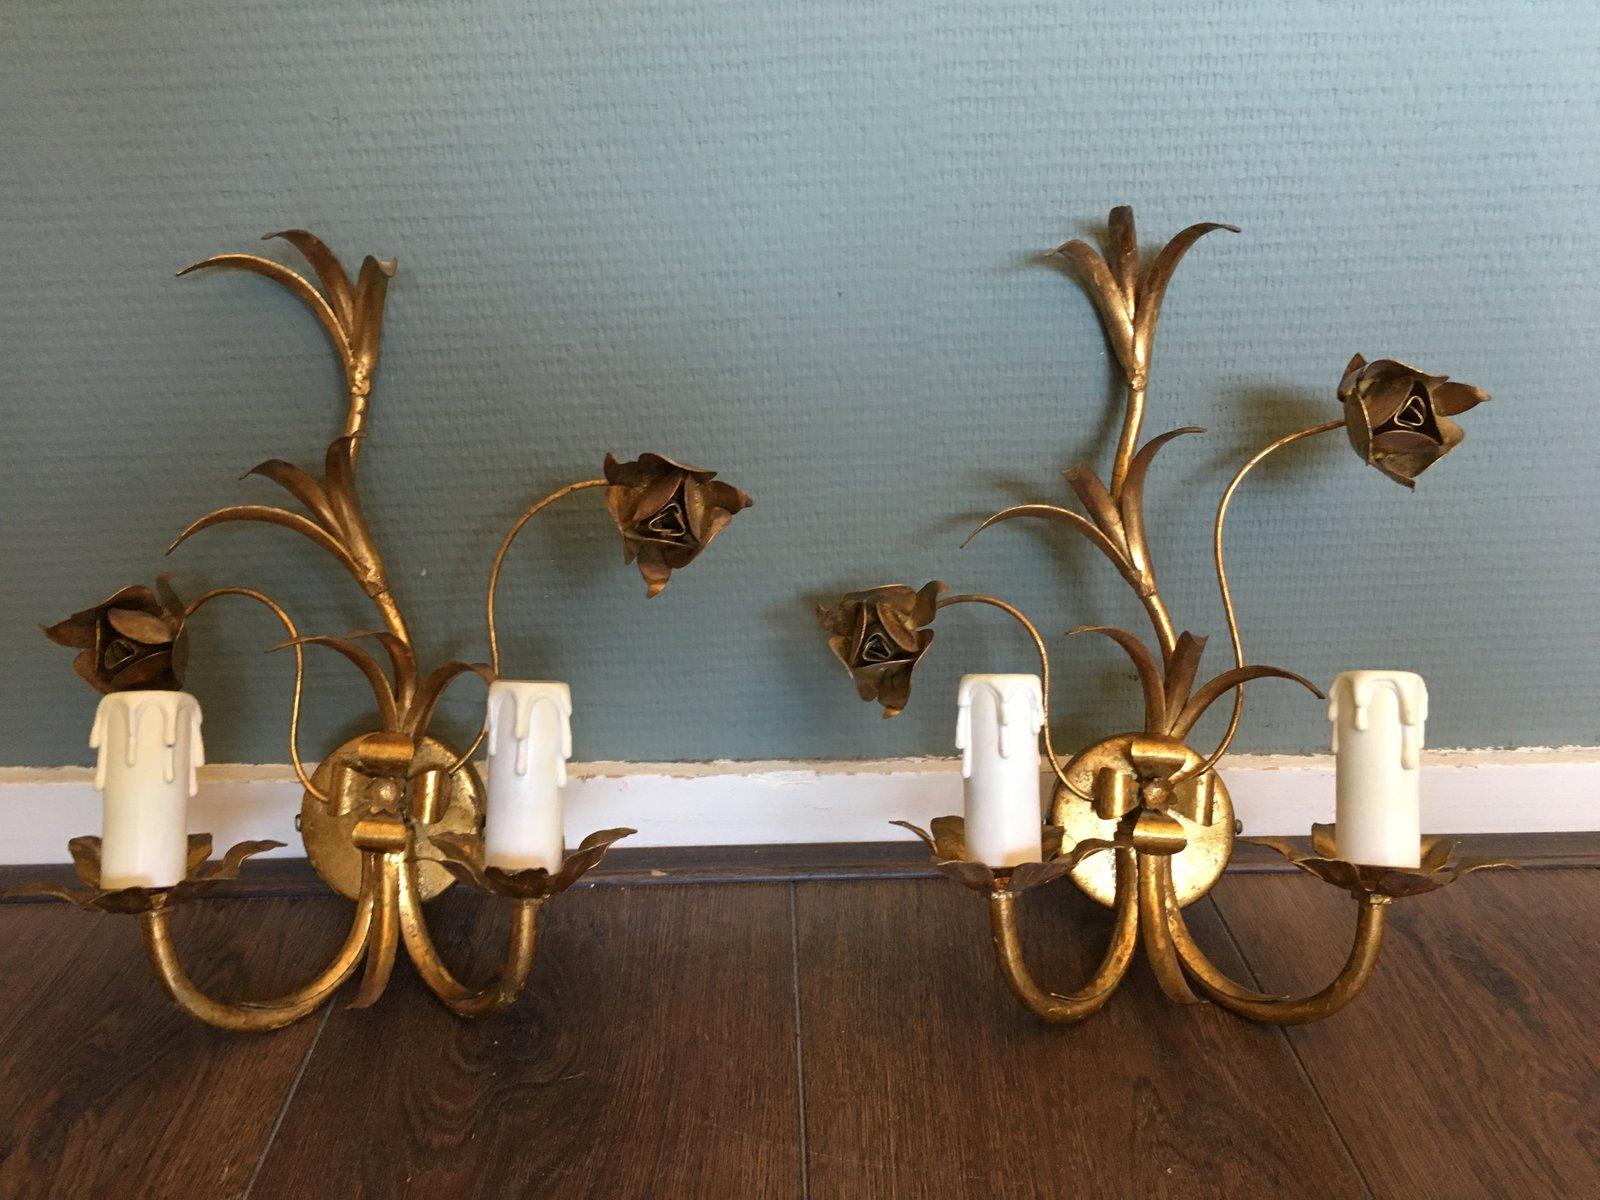 Hollywood Regency Wandleuchten aus vergoldetem Metall, 2er Set